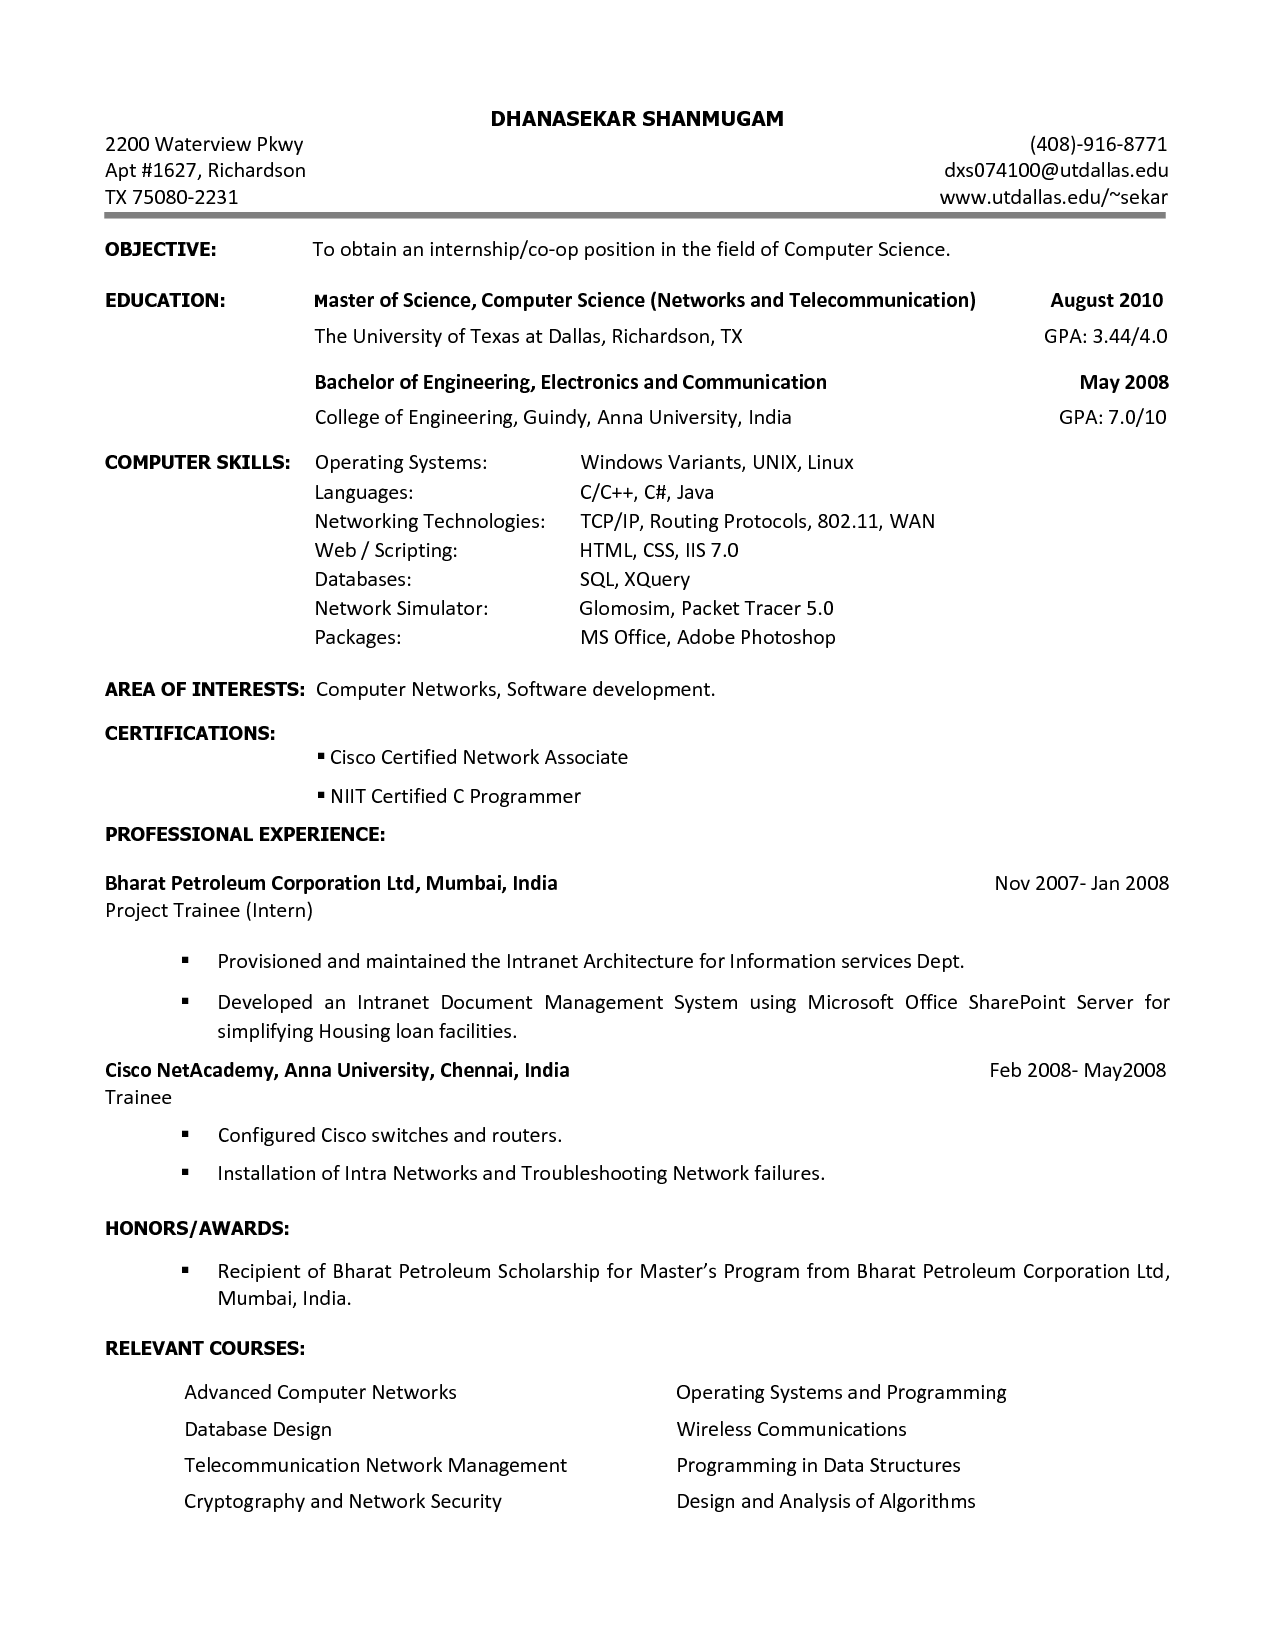 Resume Builder Resume Builder Free Download Free Resume Builder